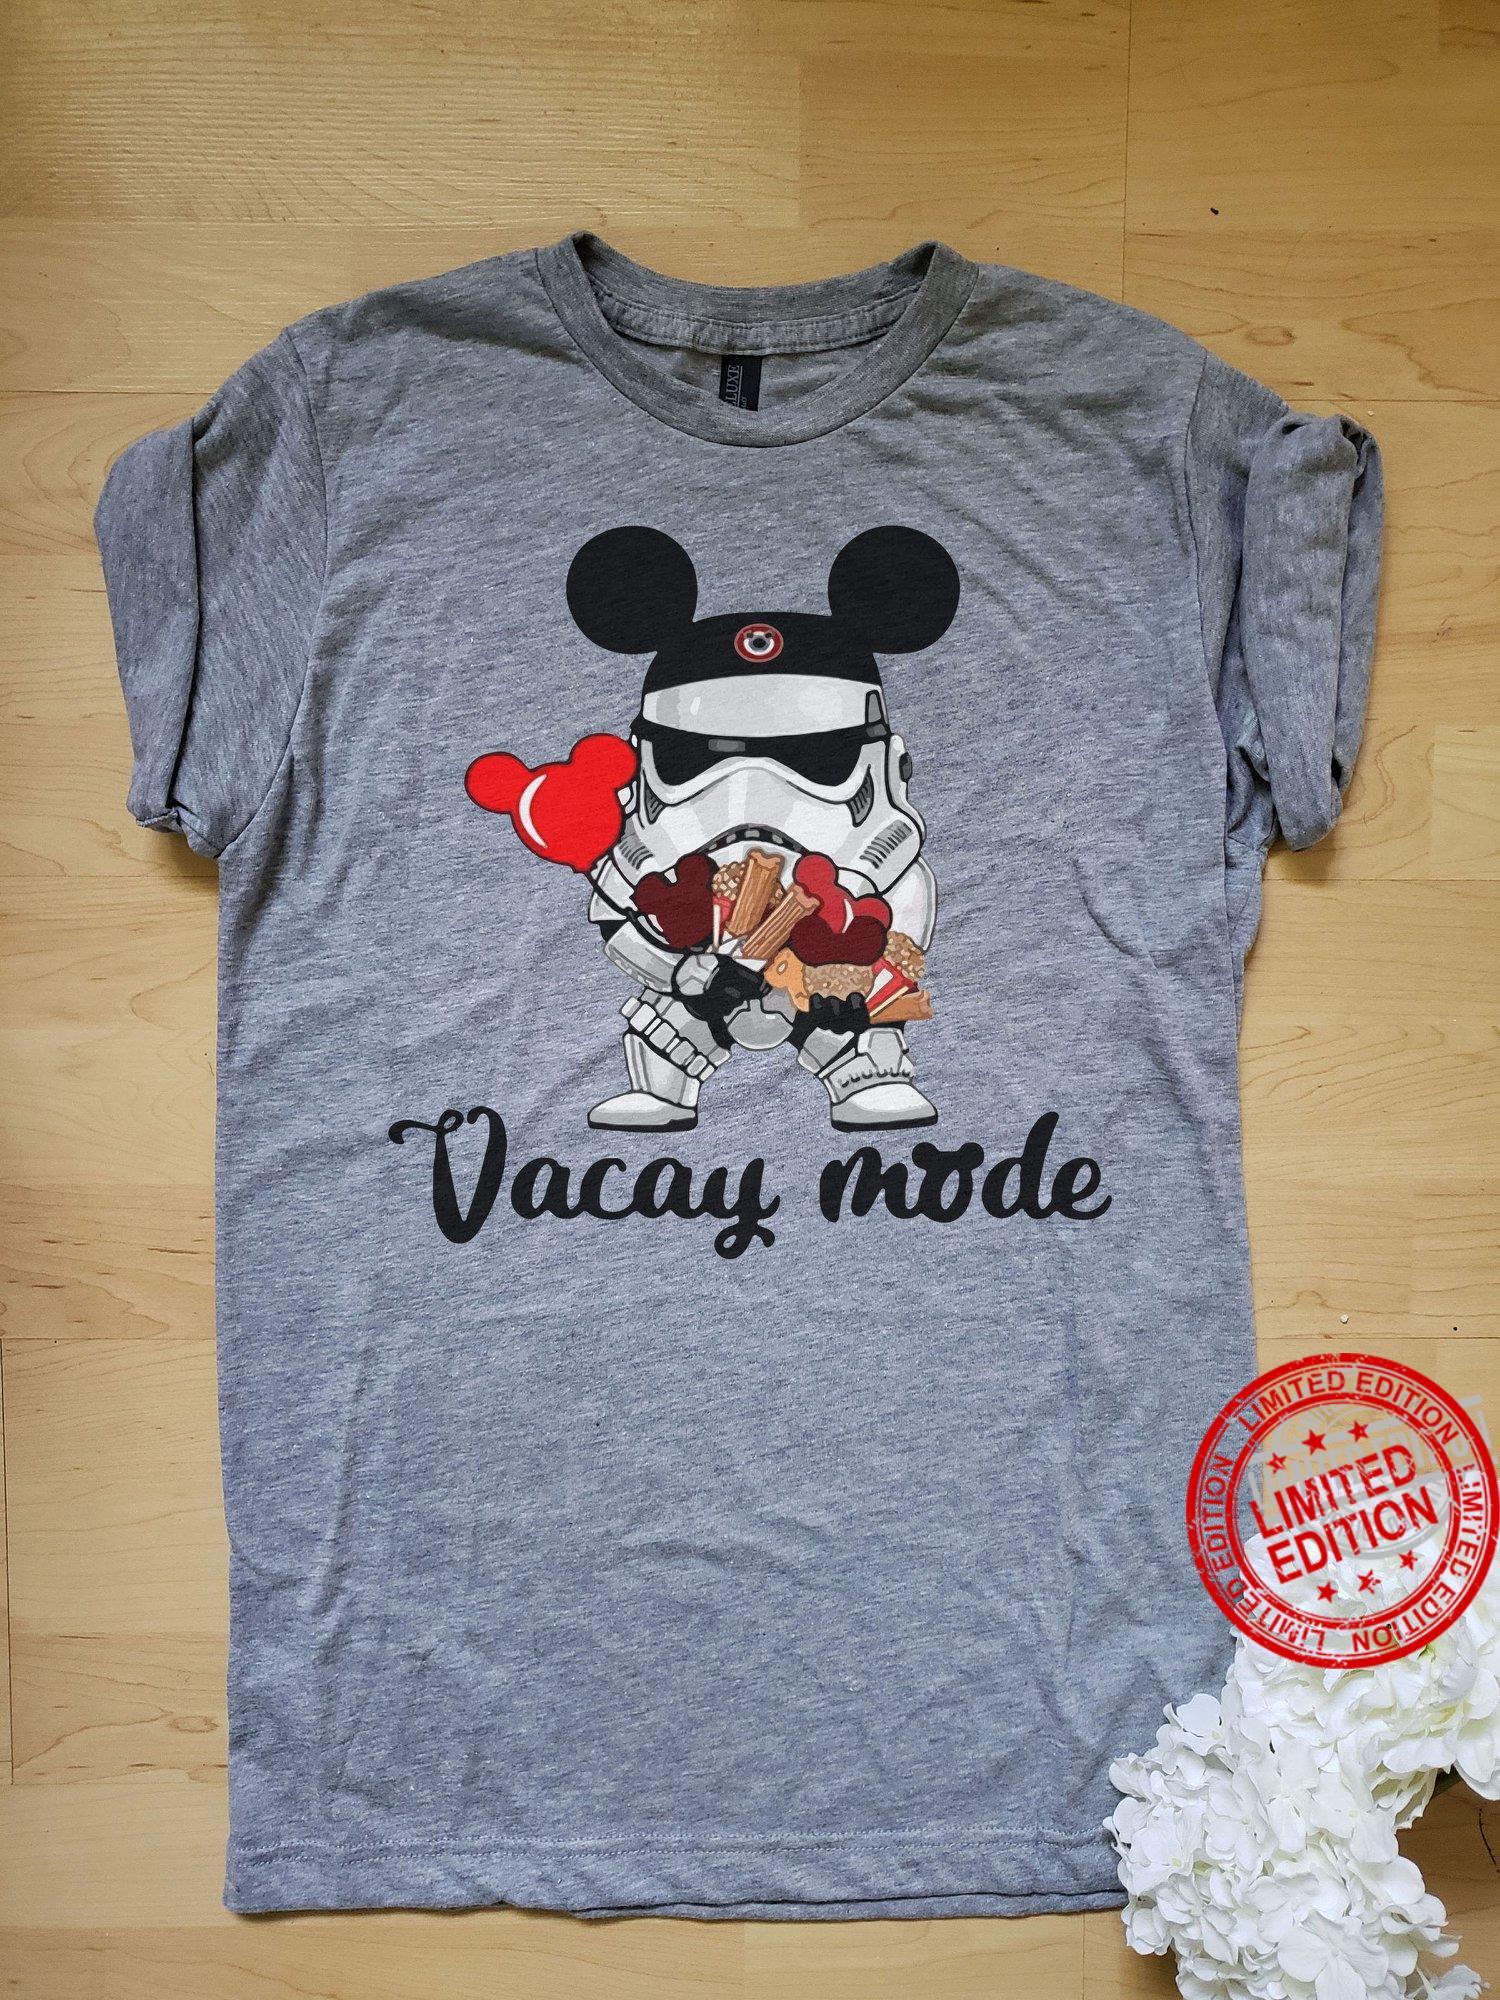 Stormtrooper Vacay Mode Shirt